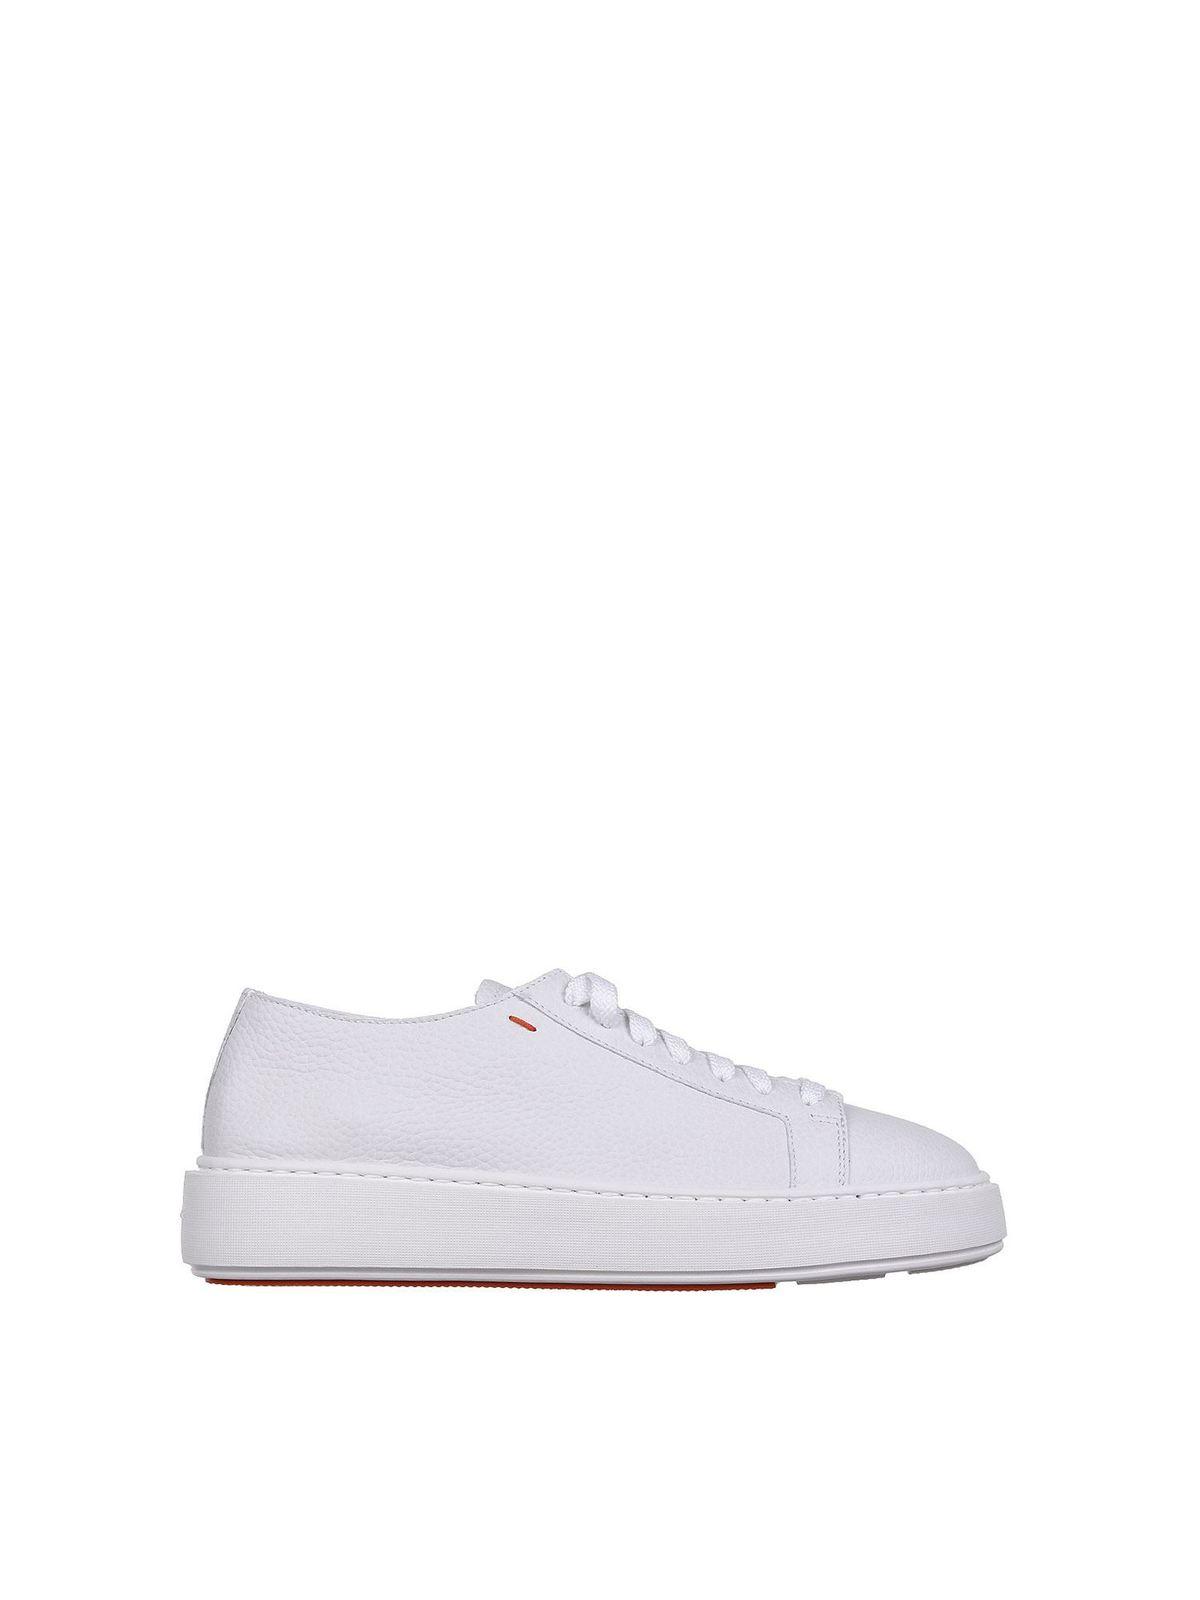 Santoni Sneakers LOW TOP SNEAKERS IN WHITE